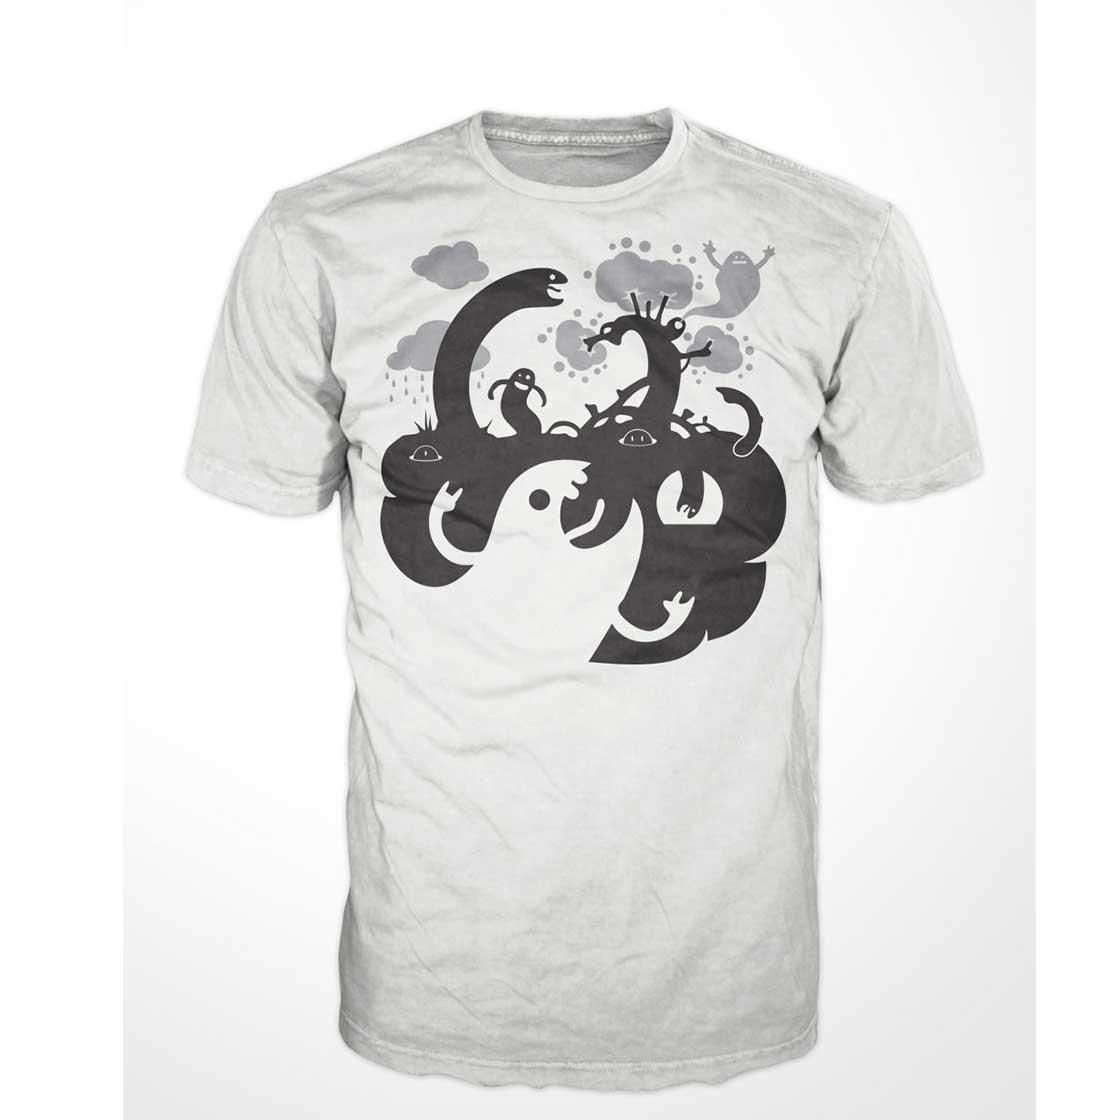 Custom TShirt Design  Online Professional TShirt Designers  crowdspring